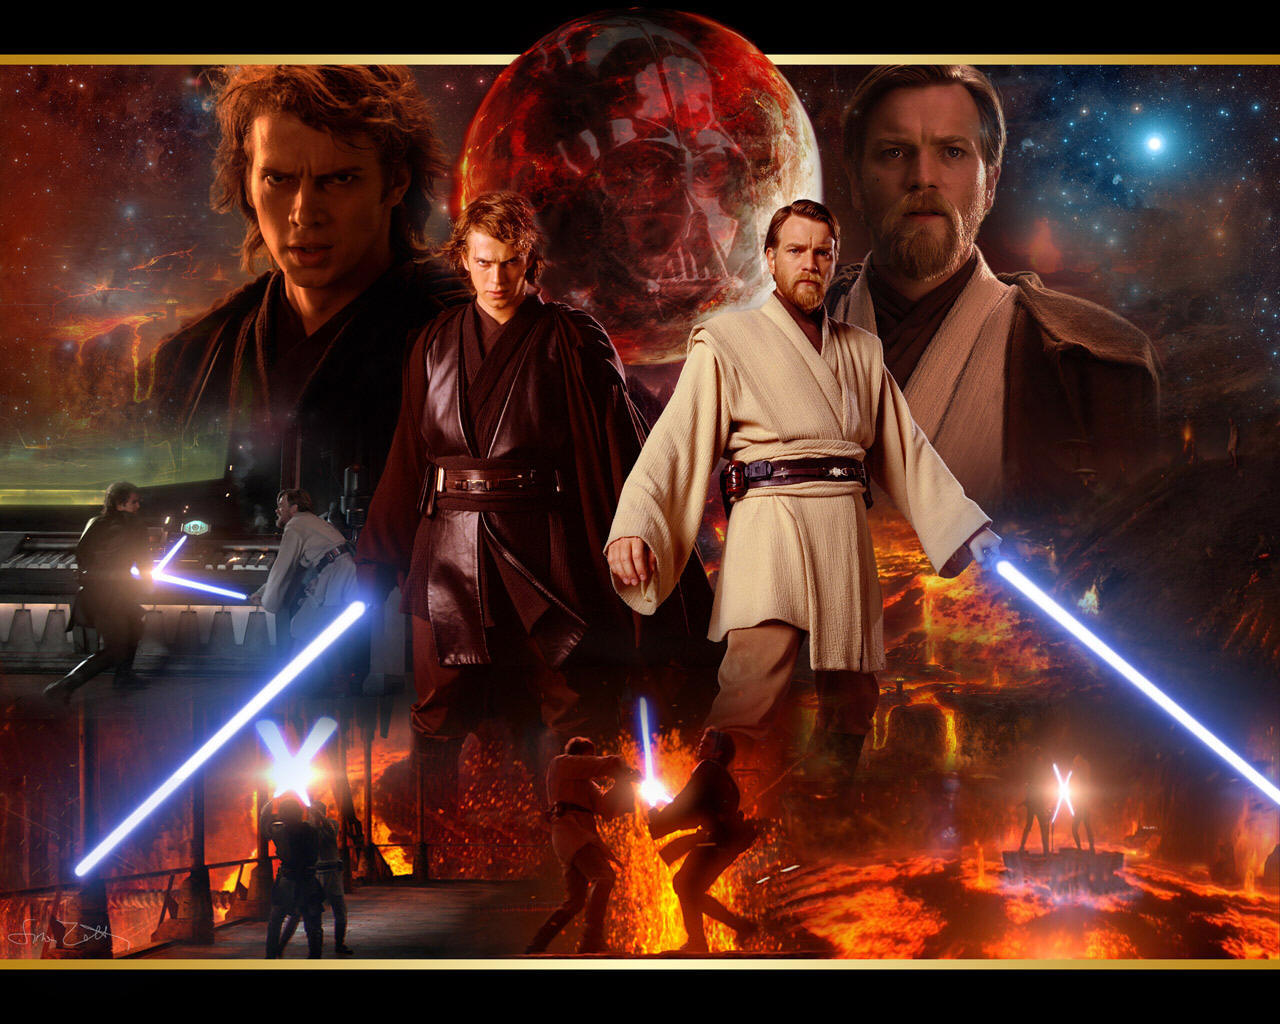 46 Anakin Vs Obi Wan Wallpaper On Wallpapersafari